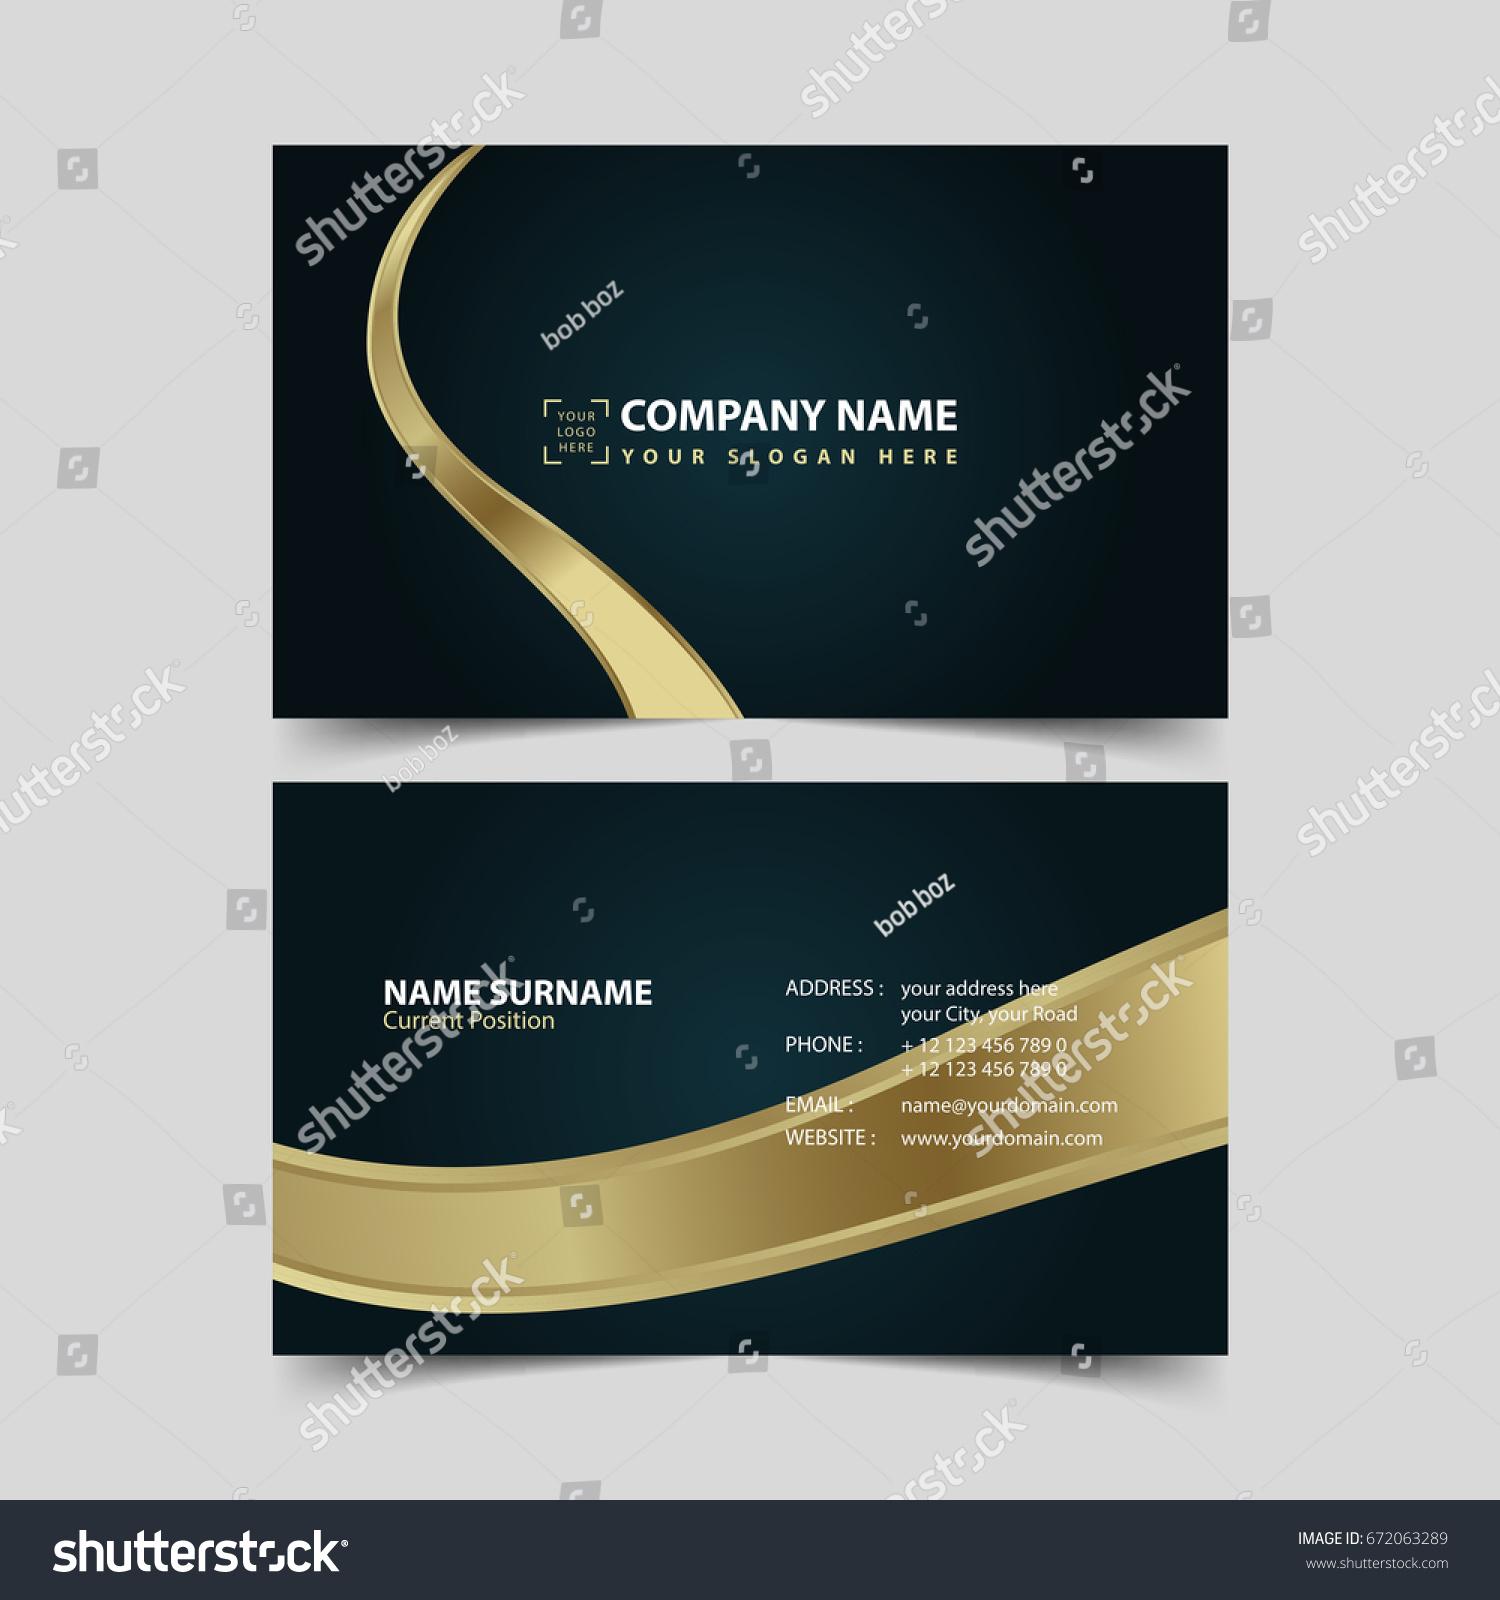 Business card design template stock vector 2018 672063289 business card design template fbccfo Choice Image